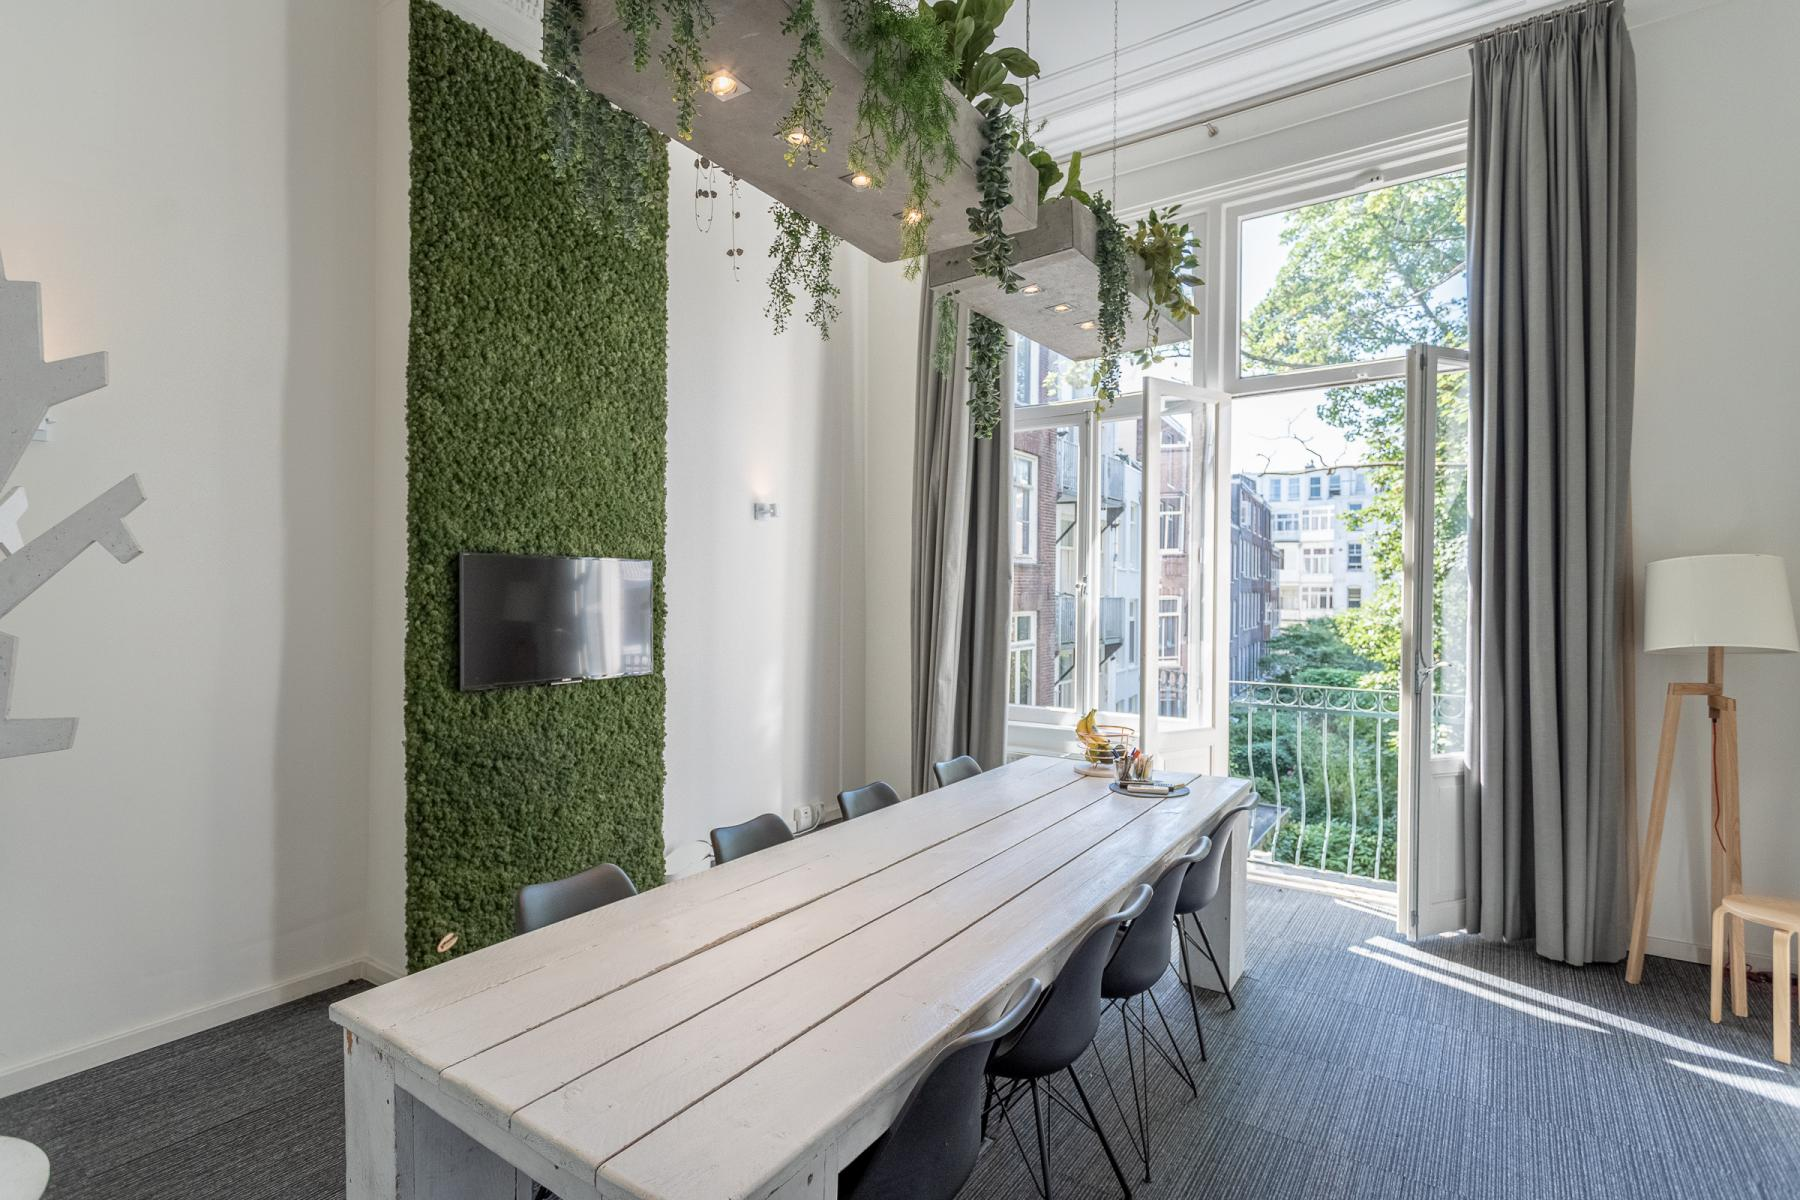 Rent office space Weteringschans 128, Amsterdam (9)